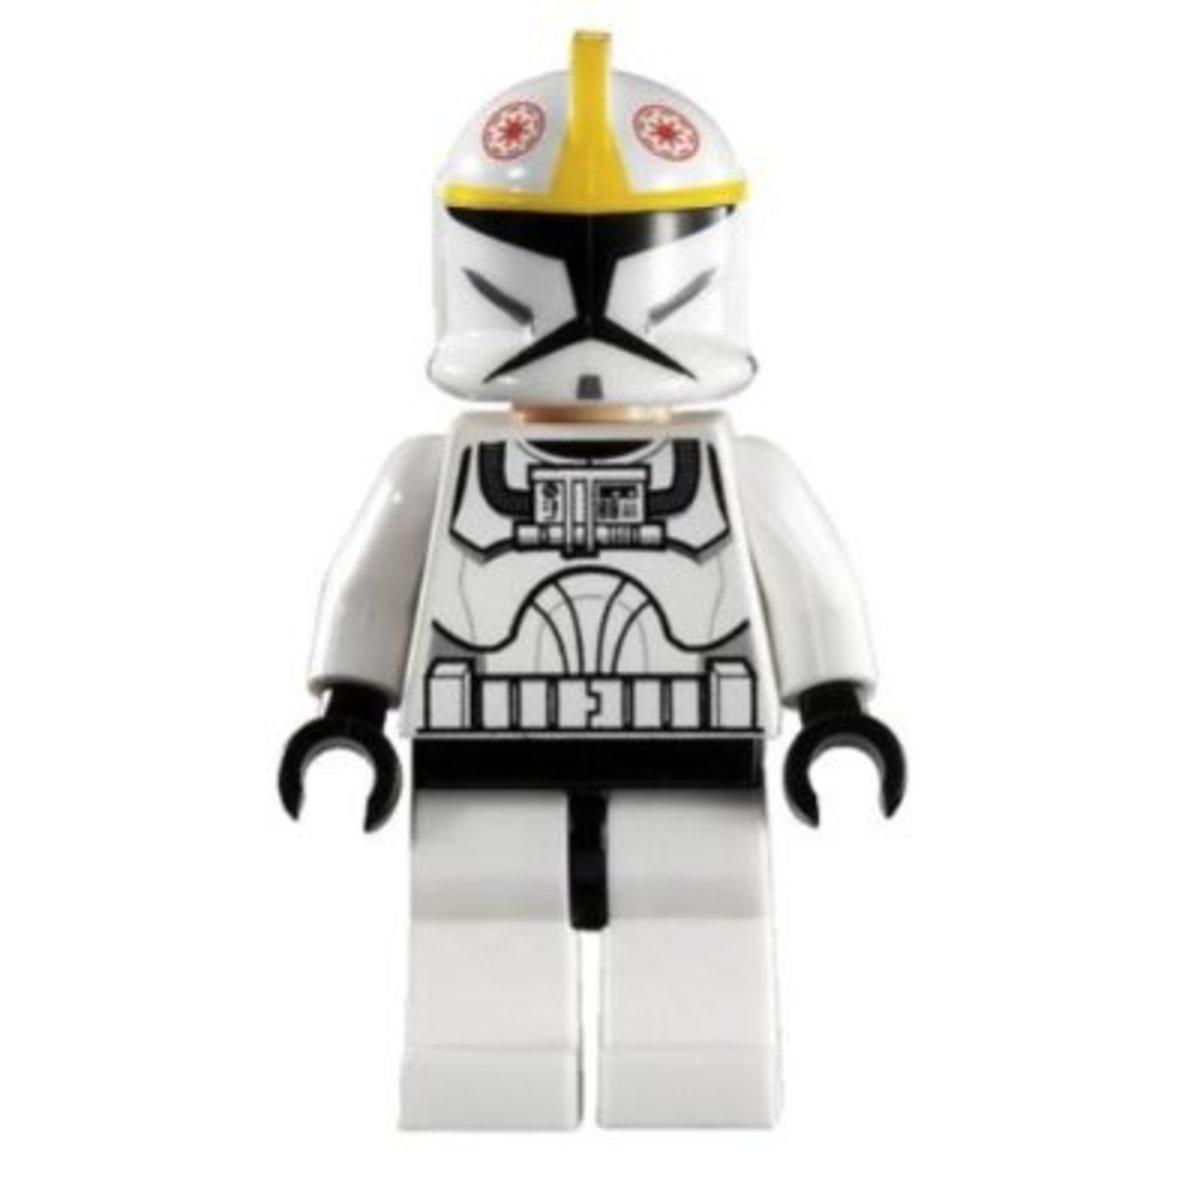 LEGO Star Wars V-19 Torrent 7674 Clone Pilot Minifigure